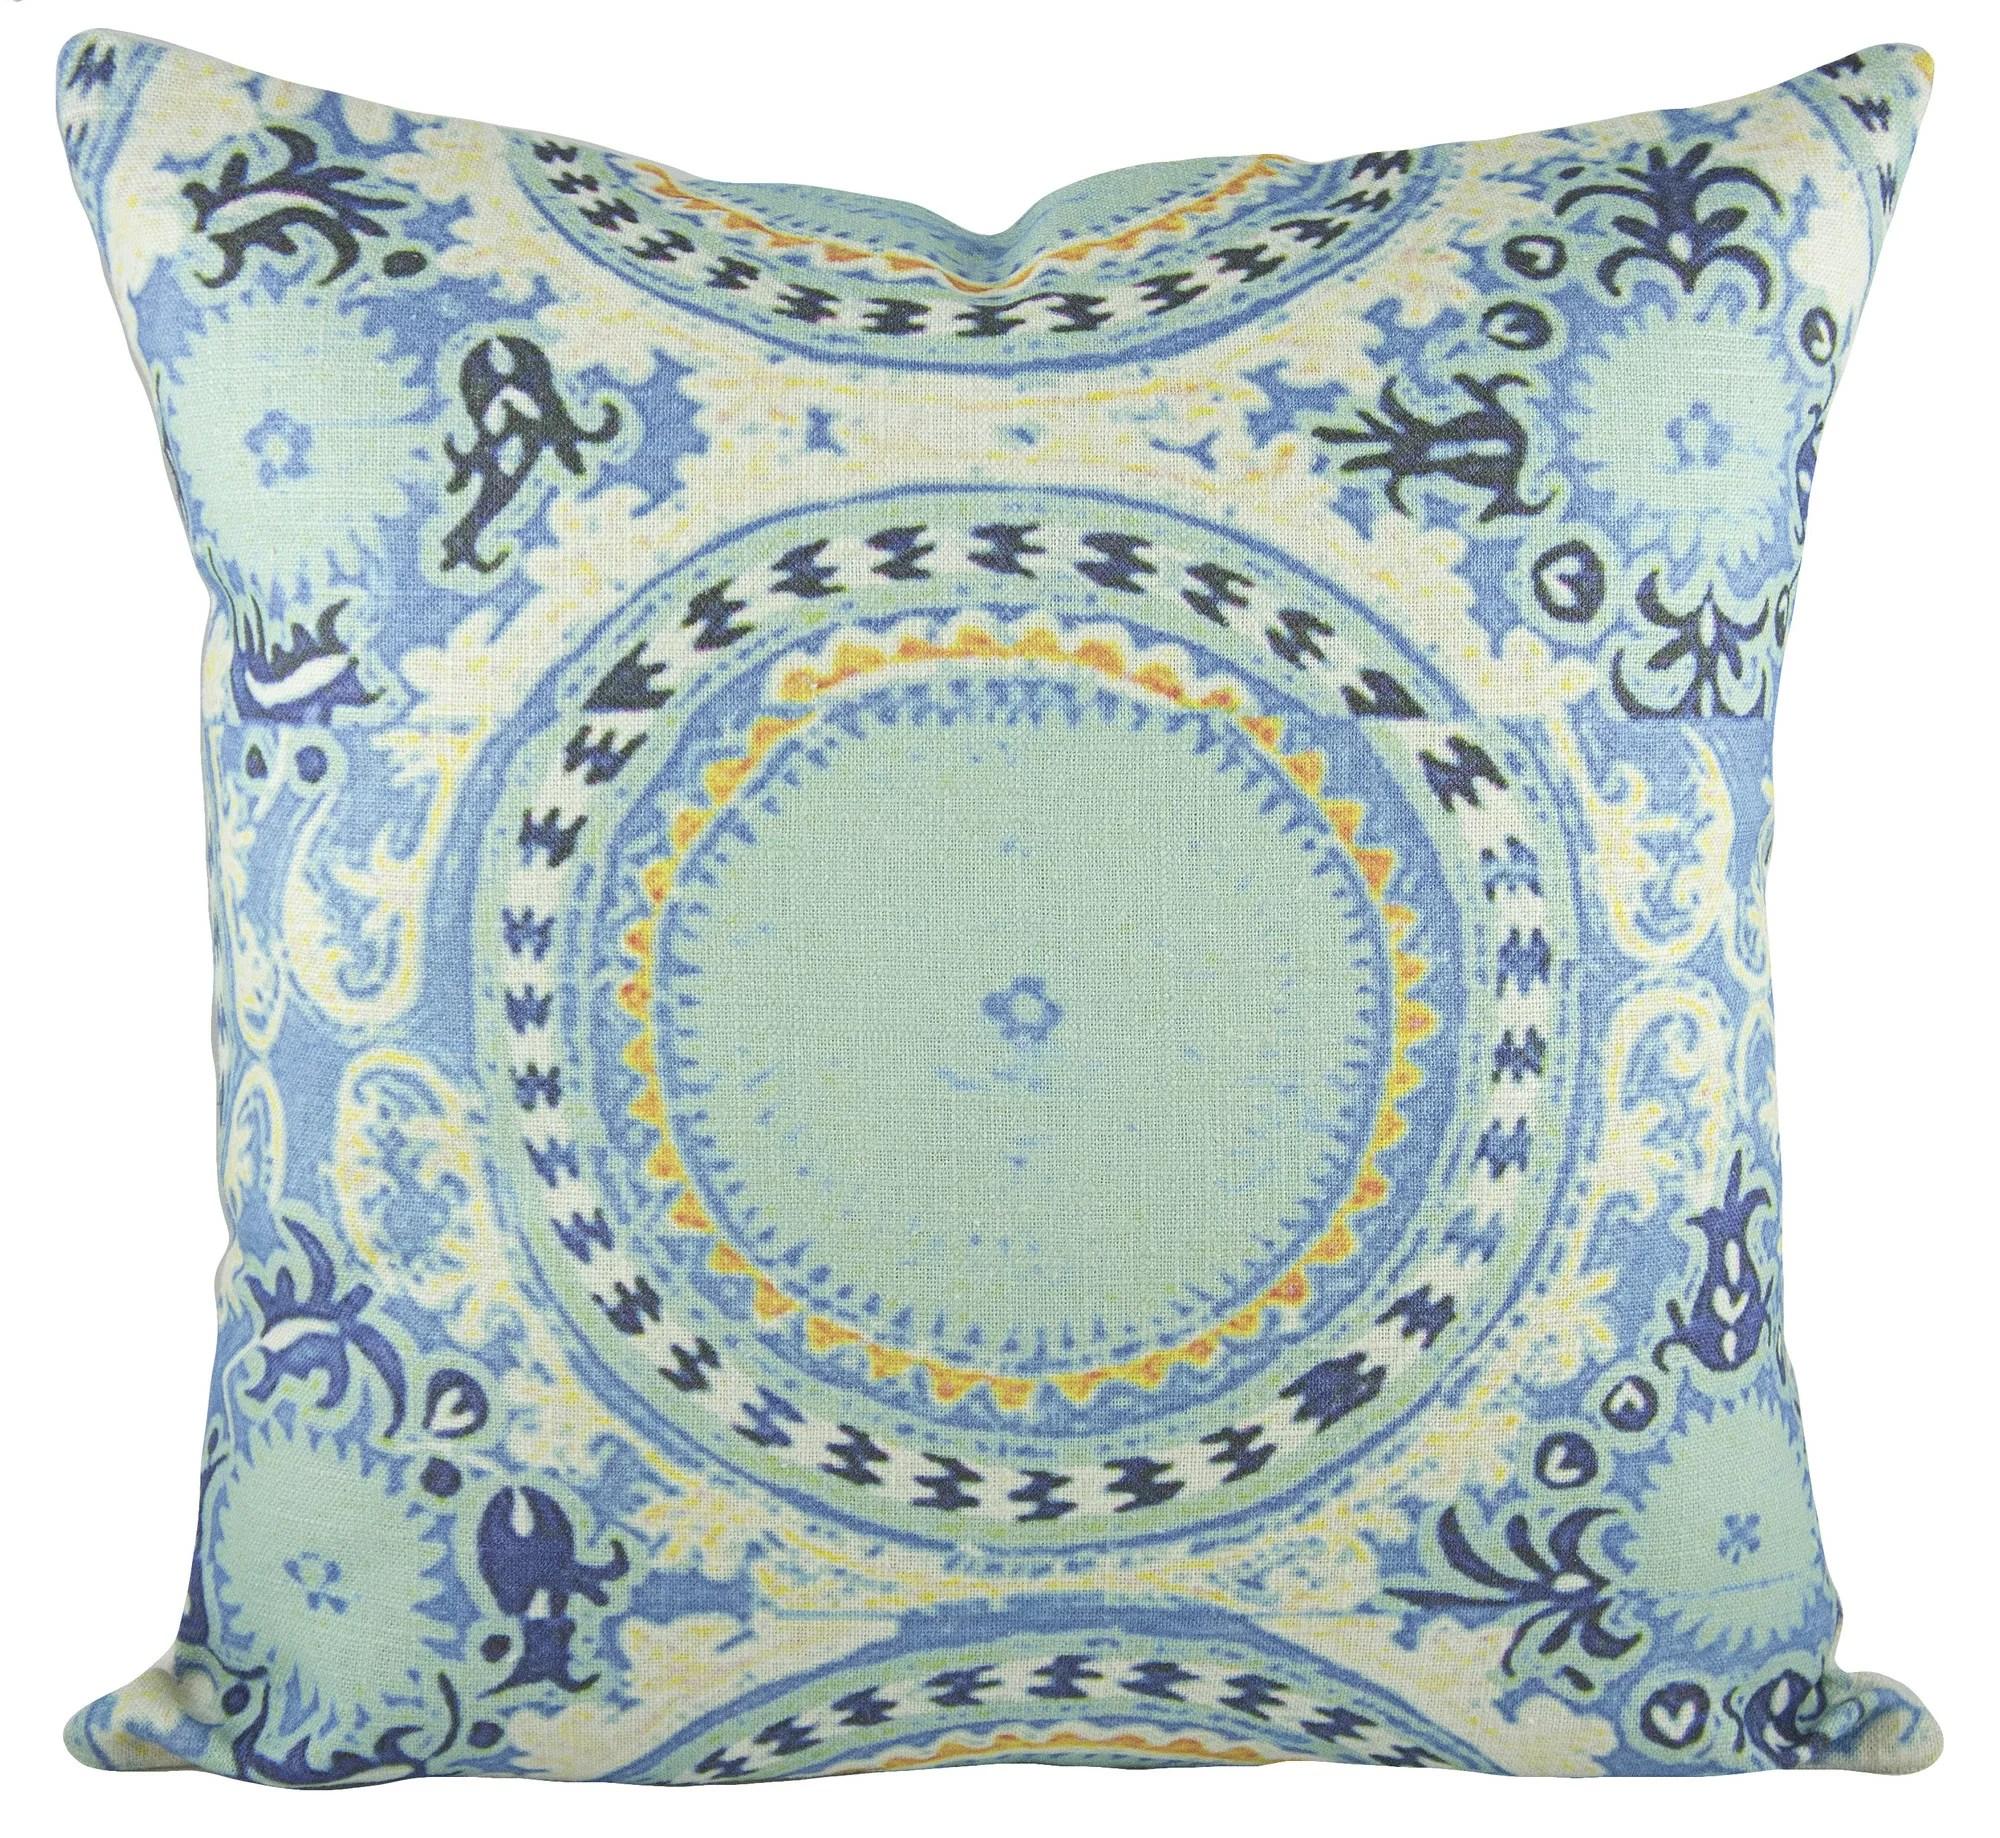 Thewatsonshop Bohemian Cotton Throw Pillow Reviews Wayfair